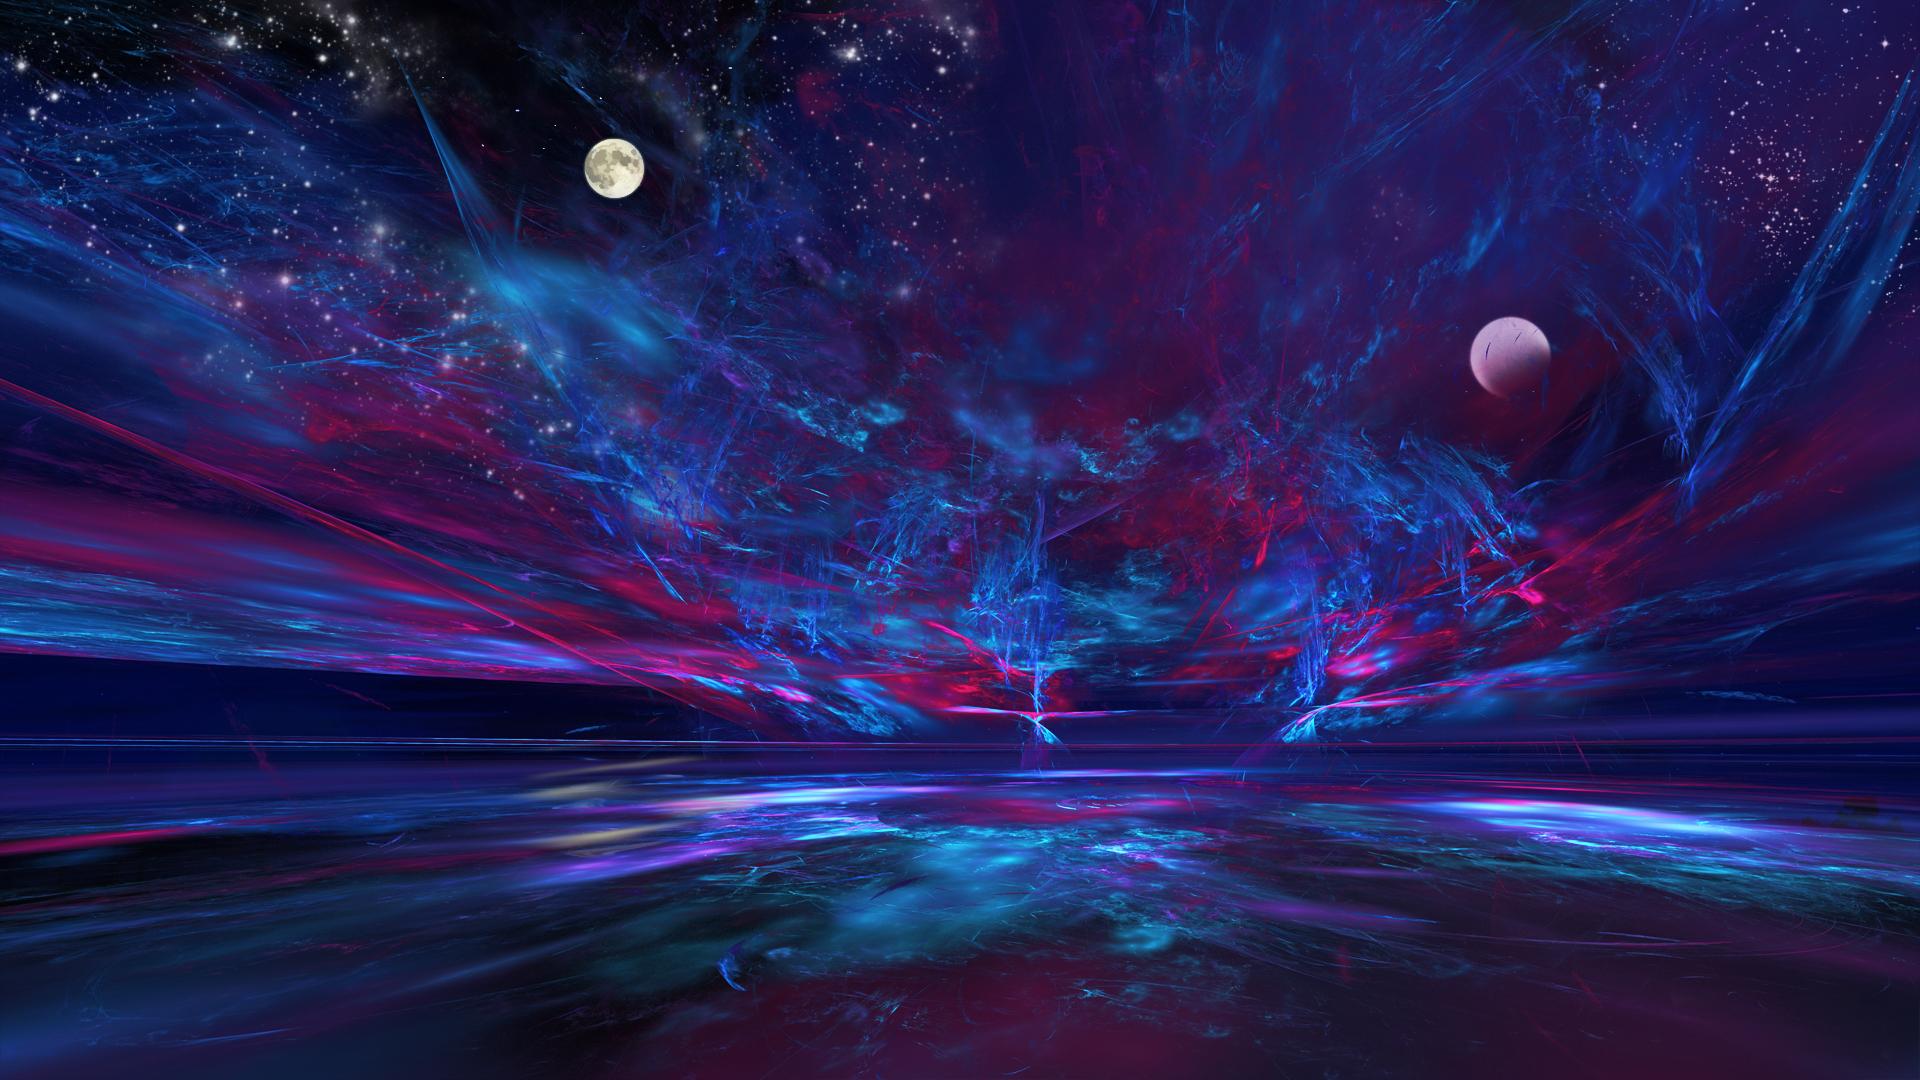 LightsFantastic by Frankief